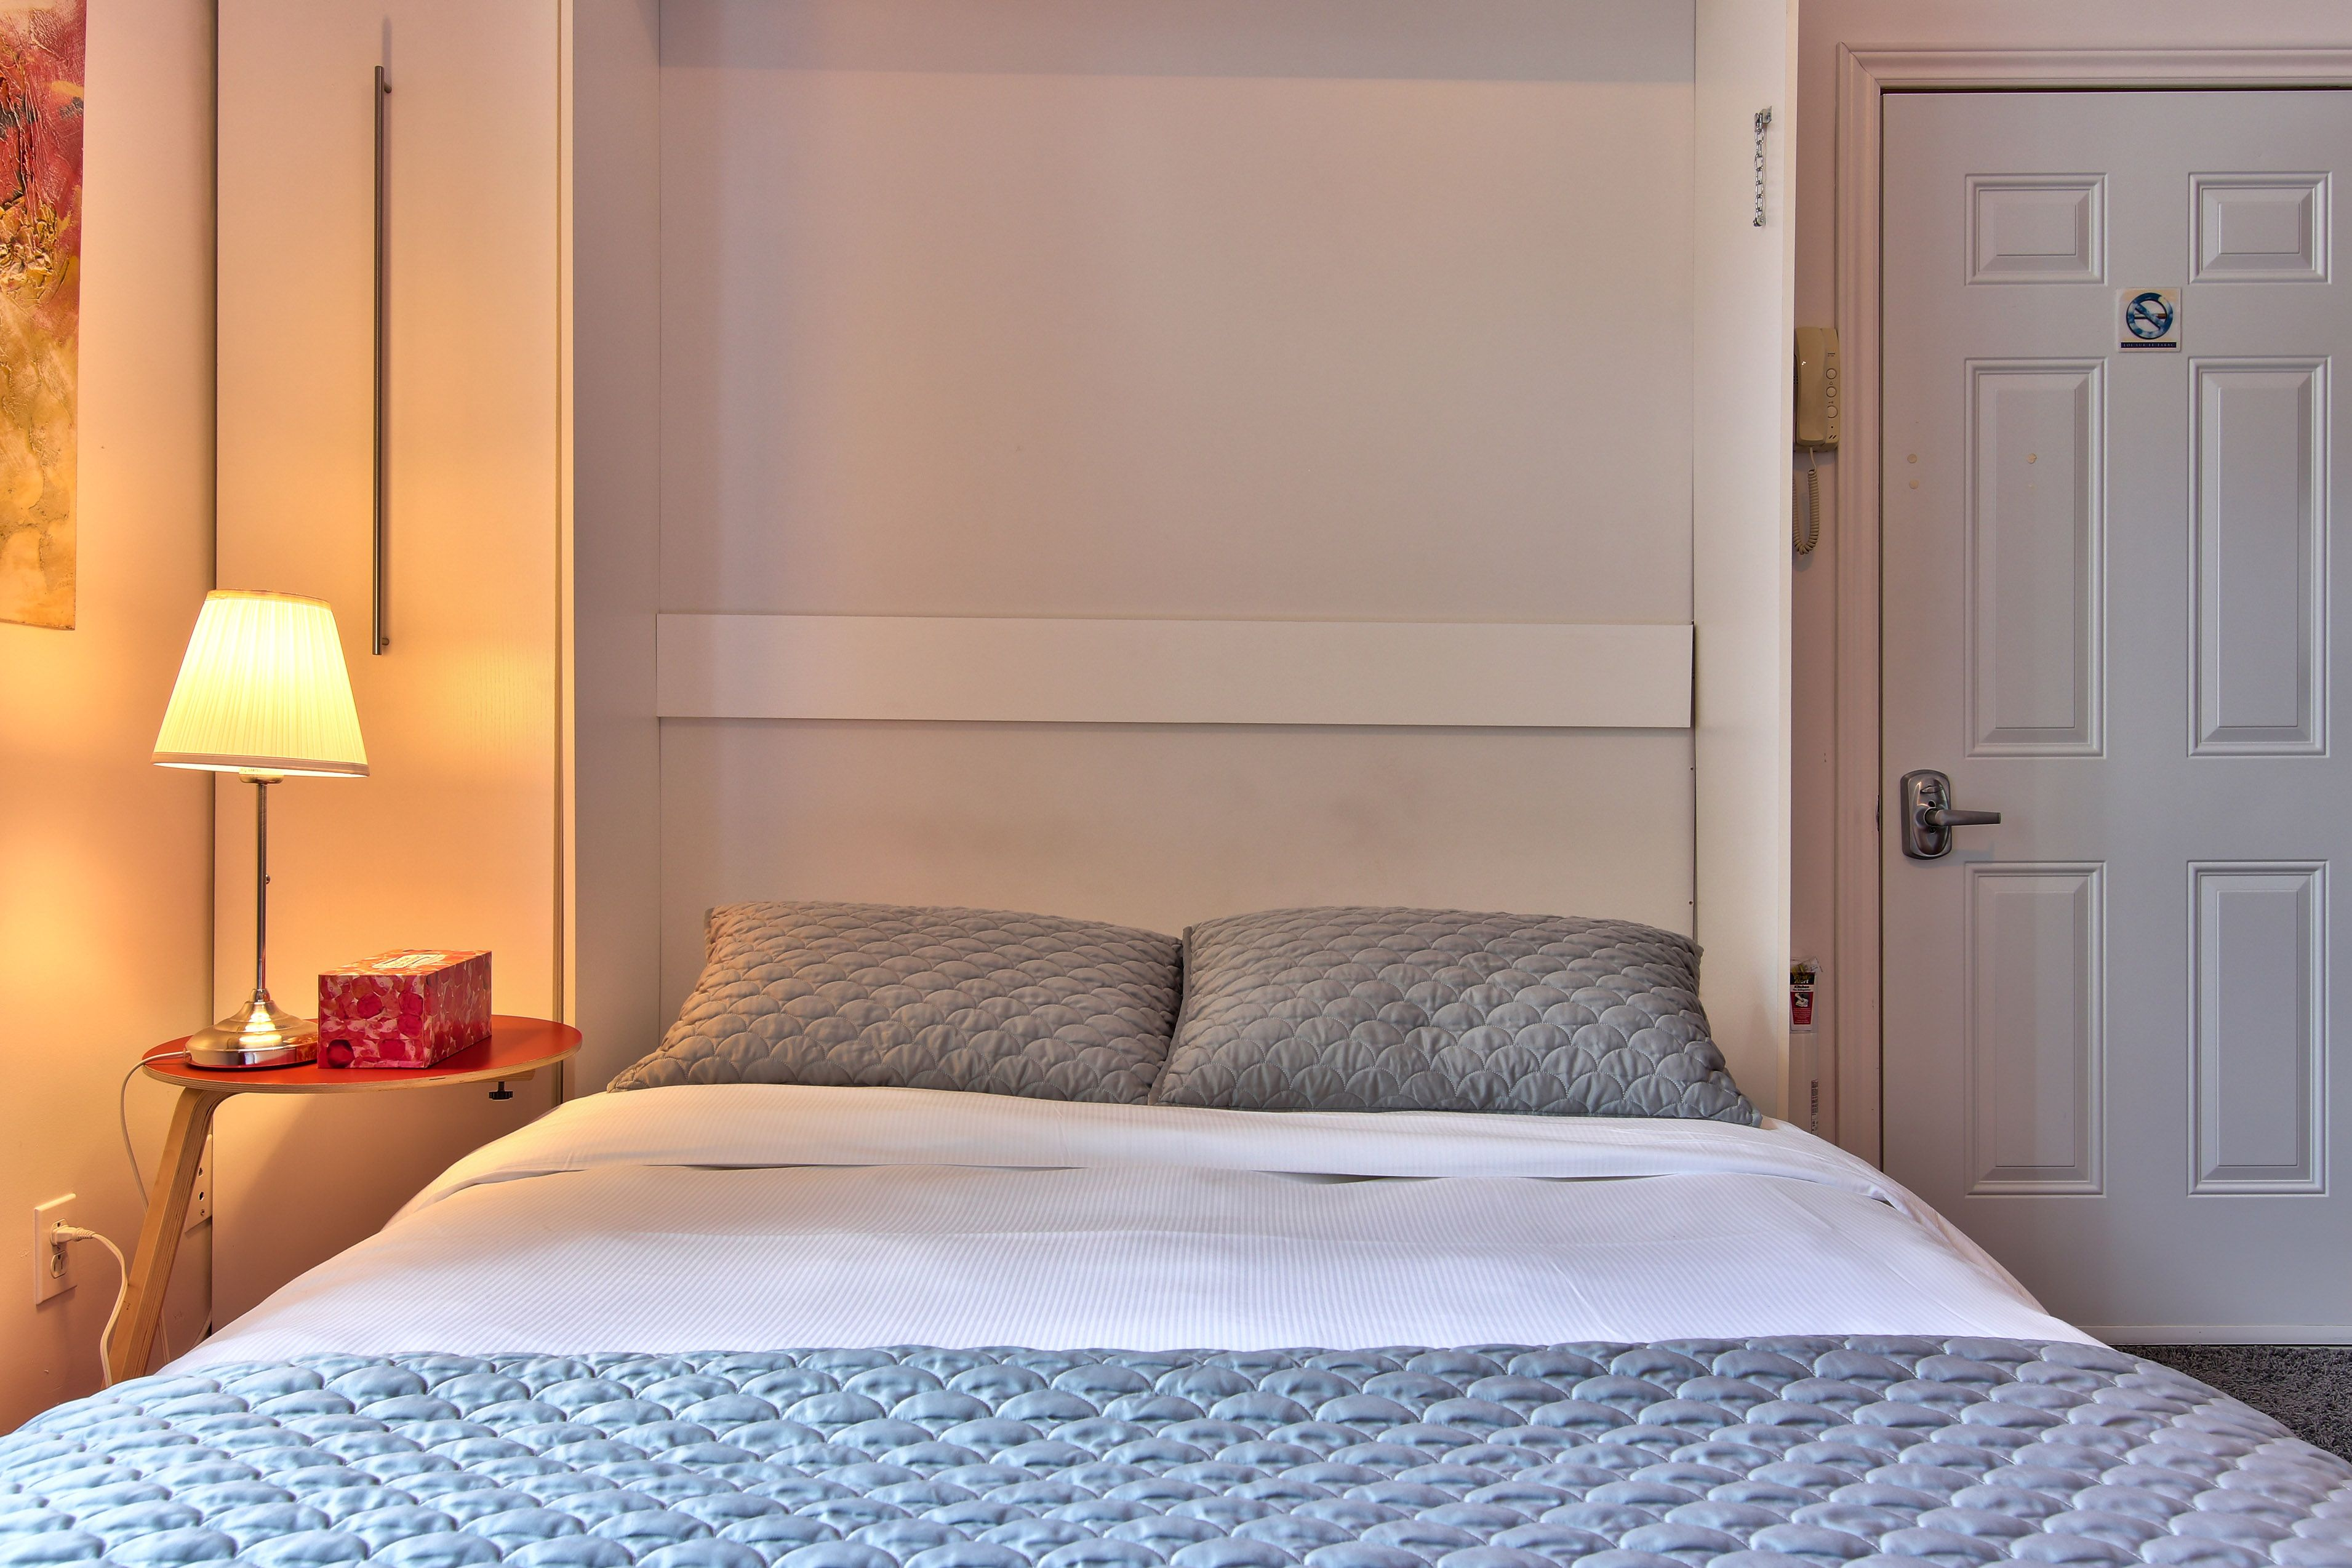 hotel-proche-palais-des-congres-montreal-studio-lit-queen